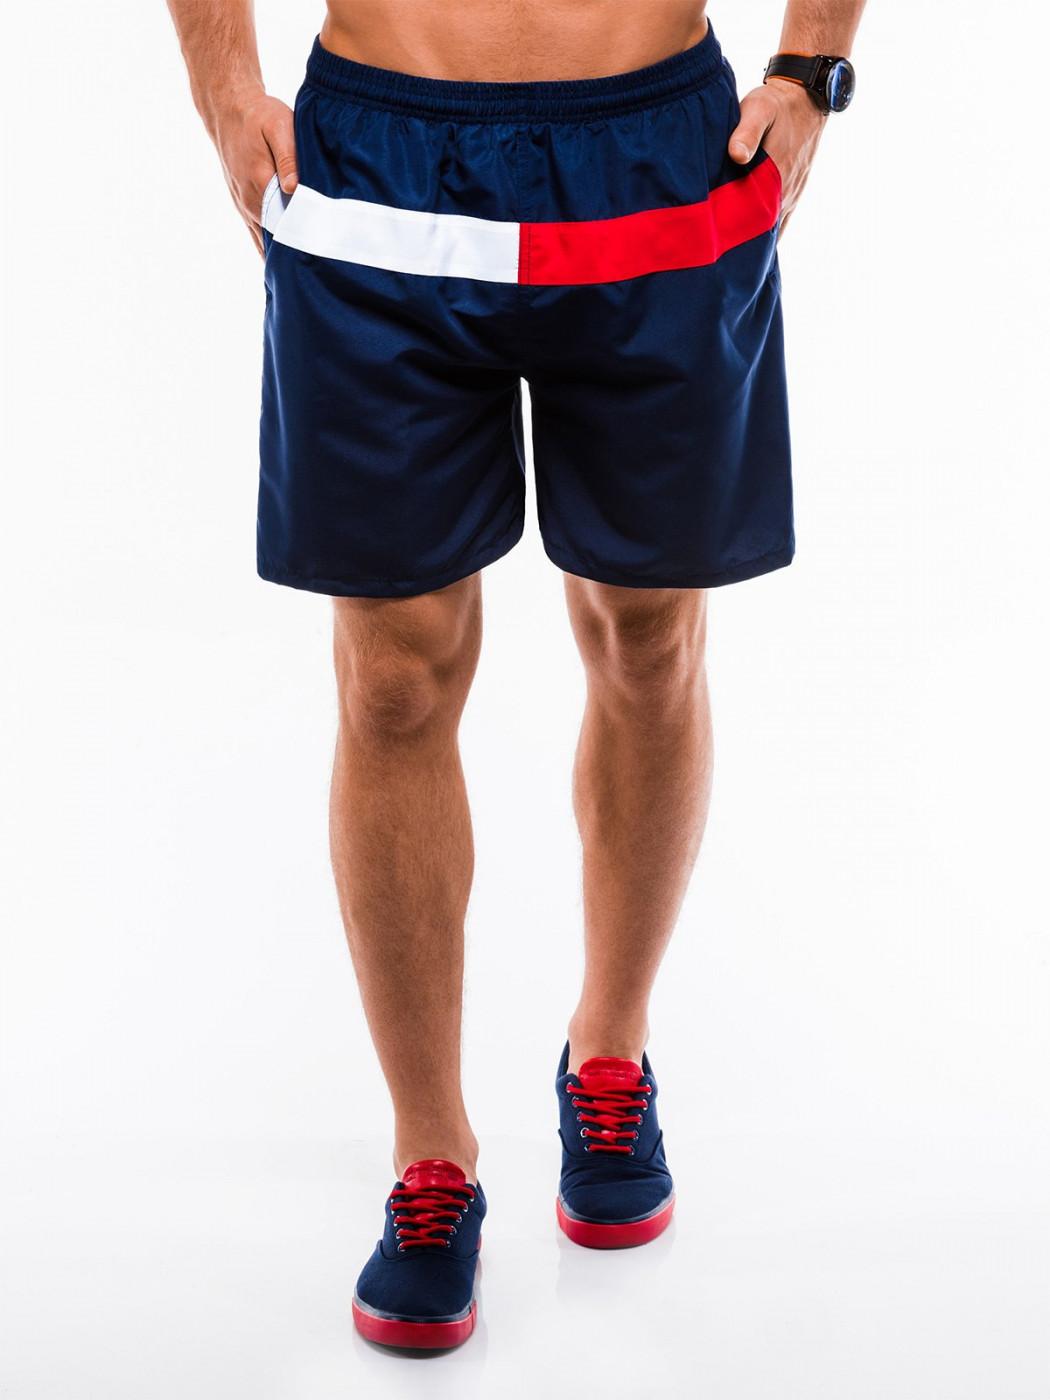 Inny Men's shorts W191